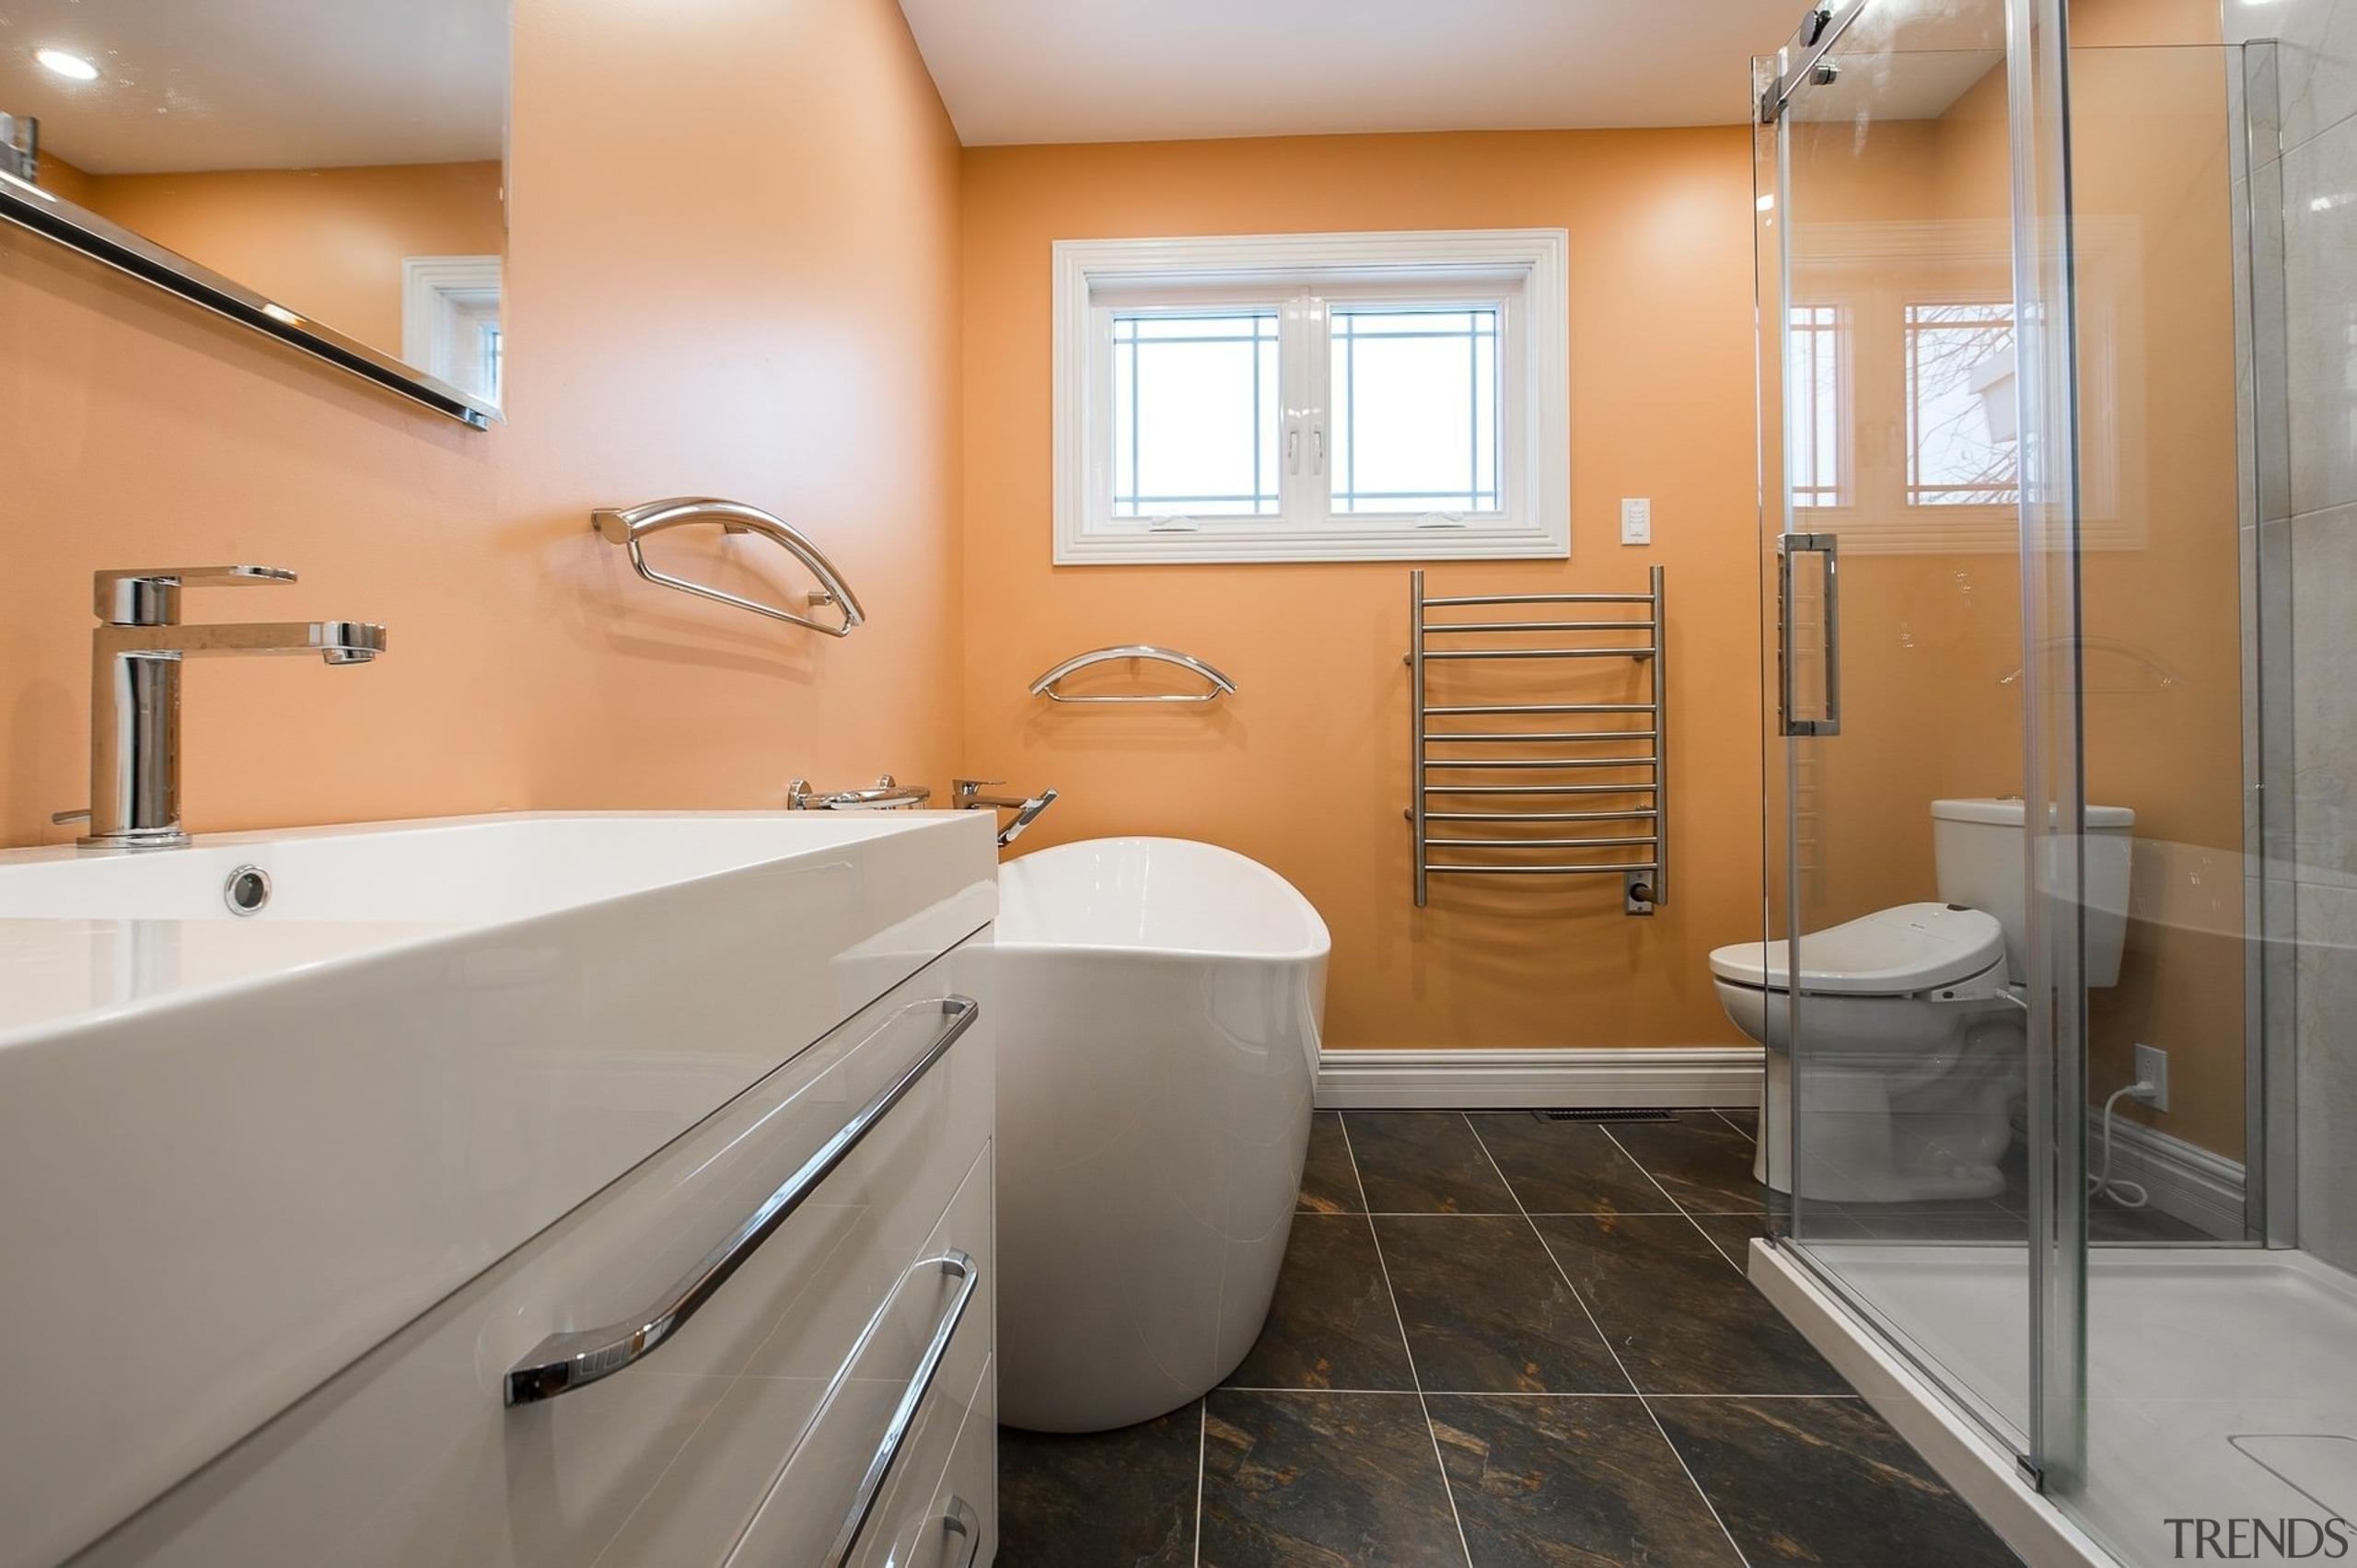 Increasing natural light is an effective way of bathroom, floor, home, interior design, real estate, room, gray, orange